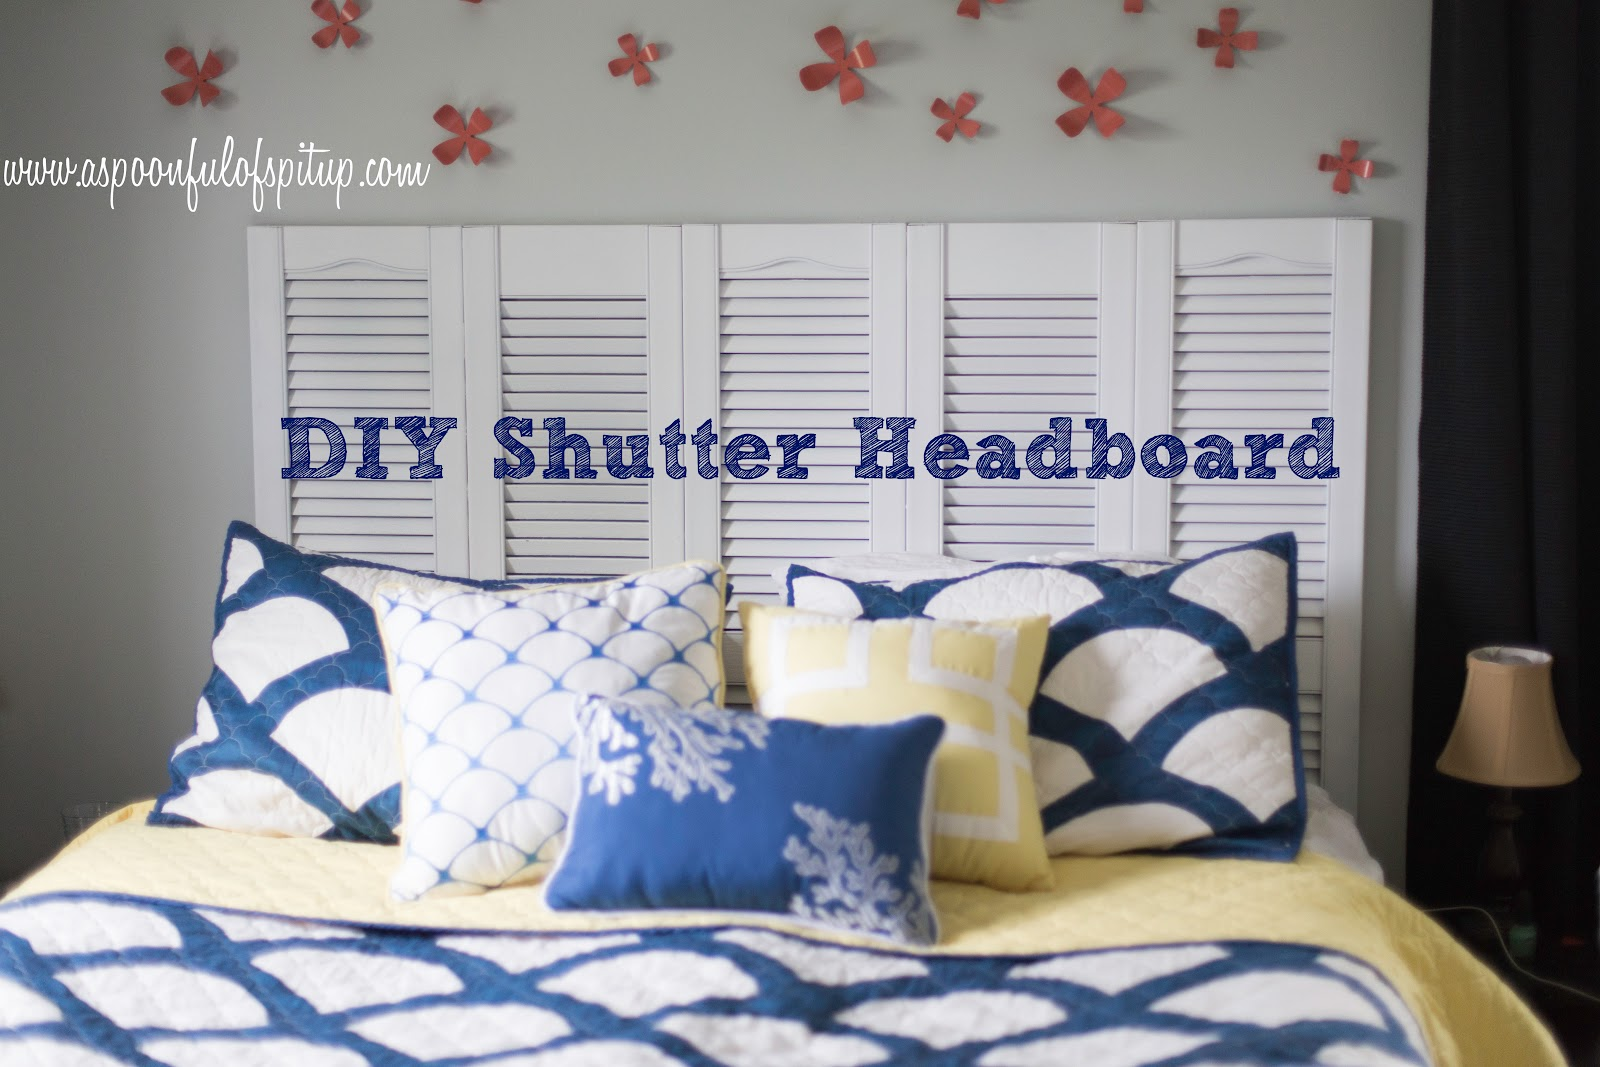 $20 DIY Shutter Headboard